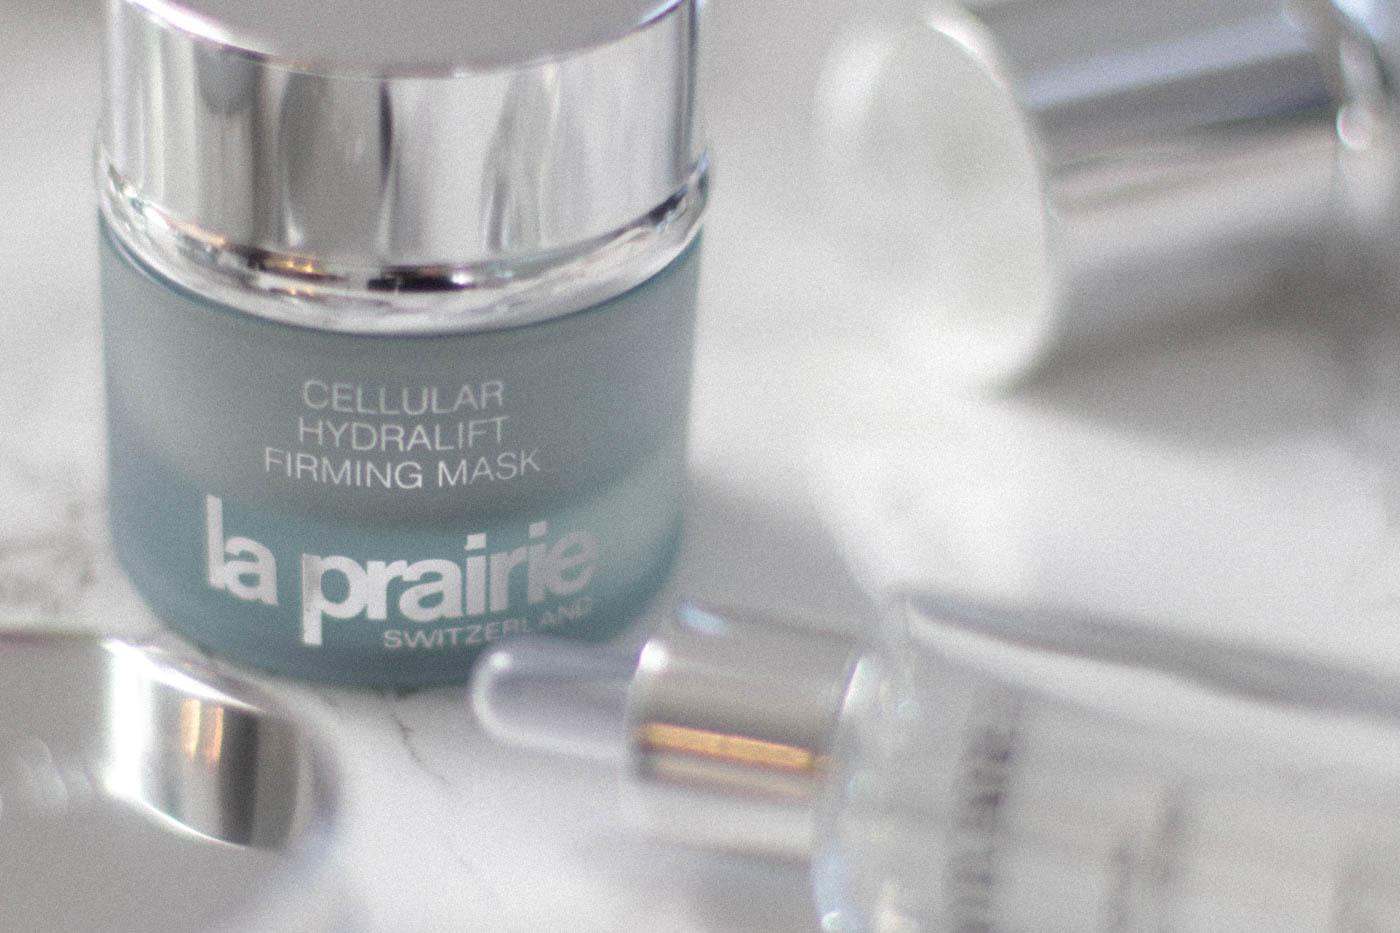 La Prairie skincare